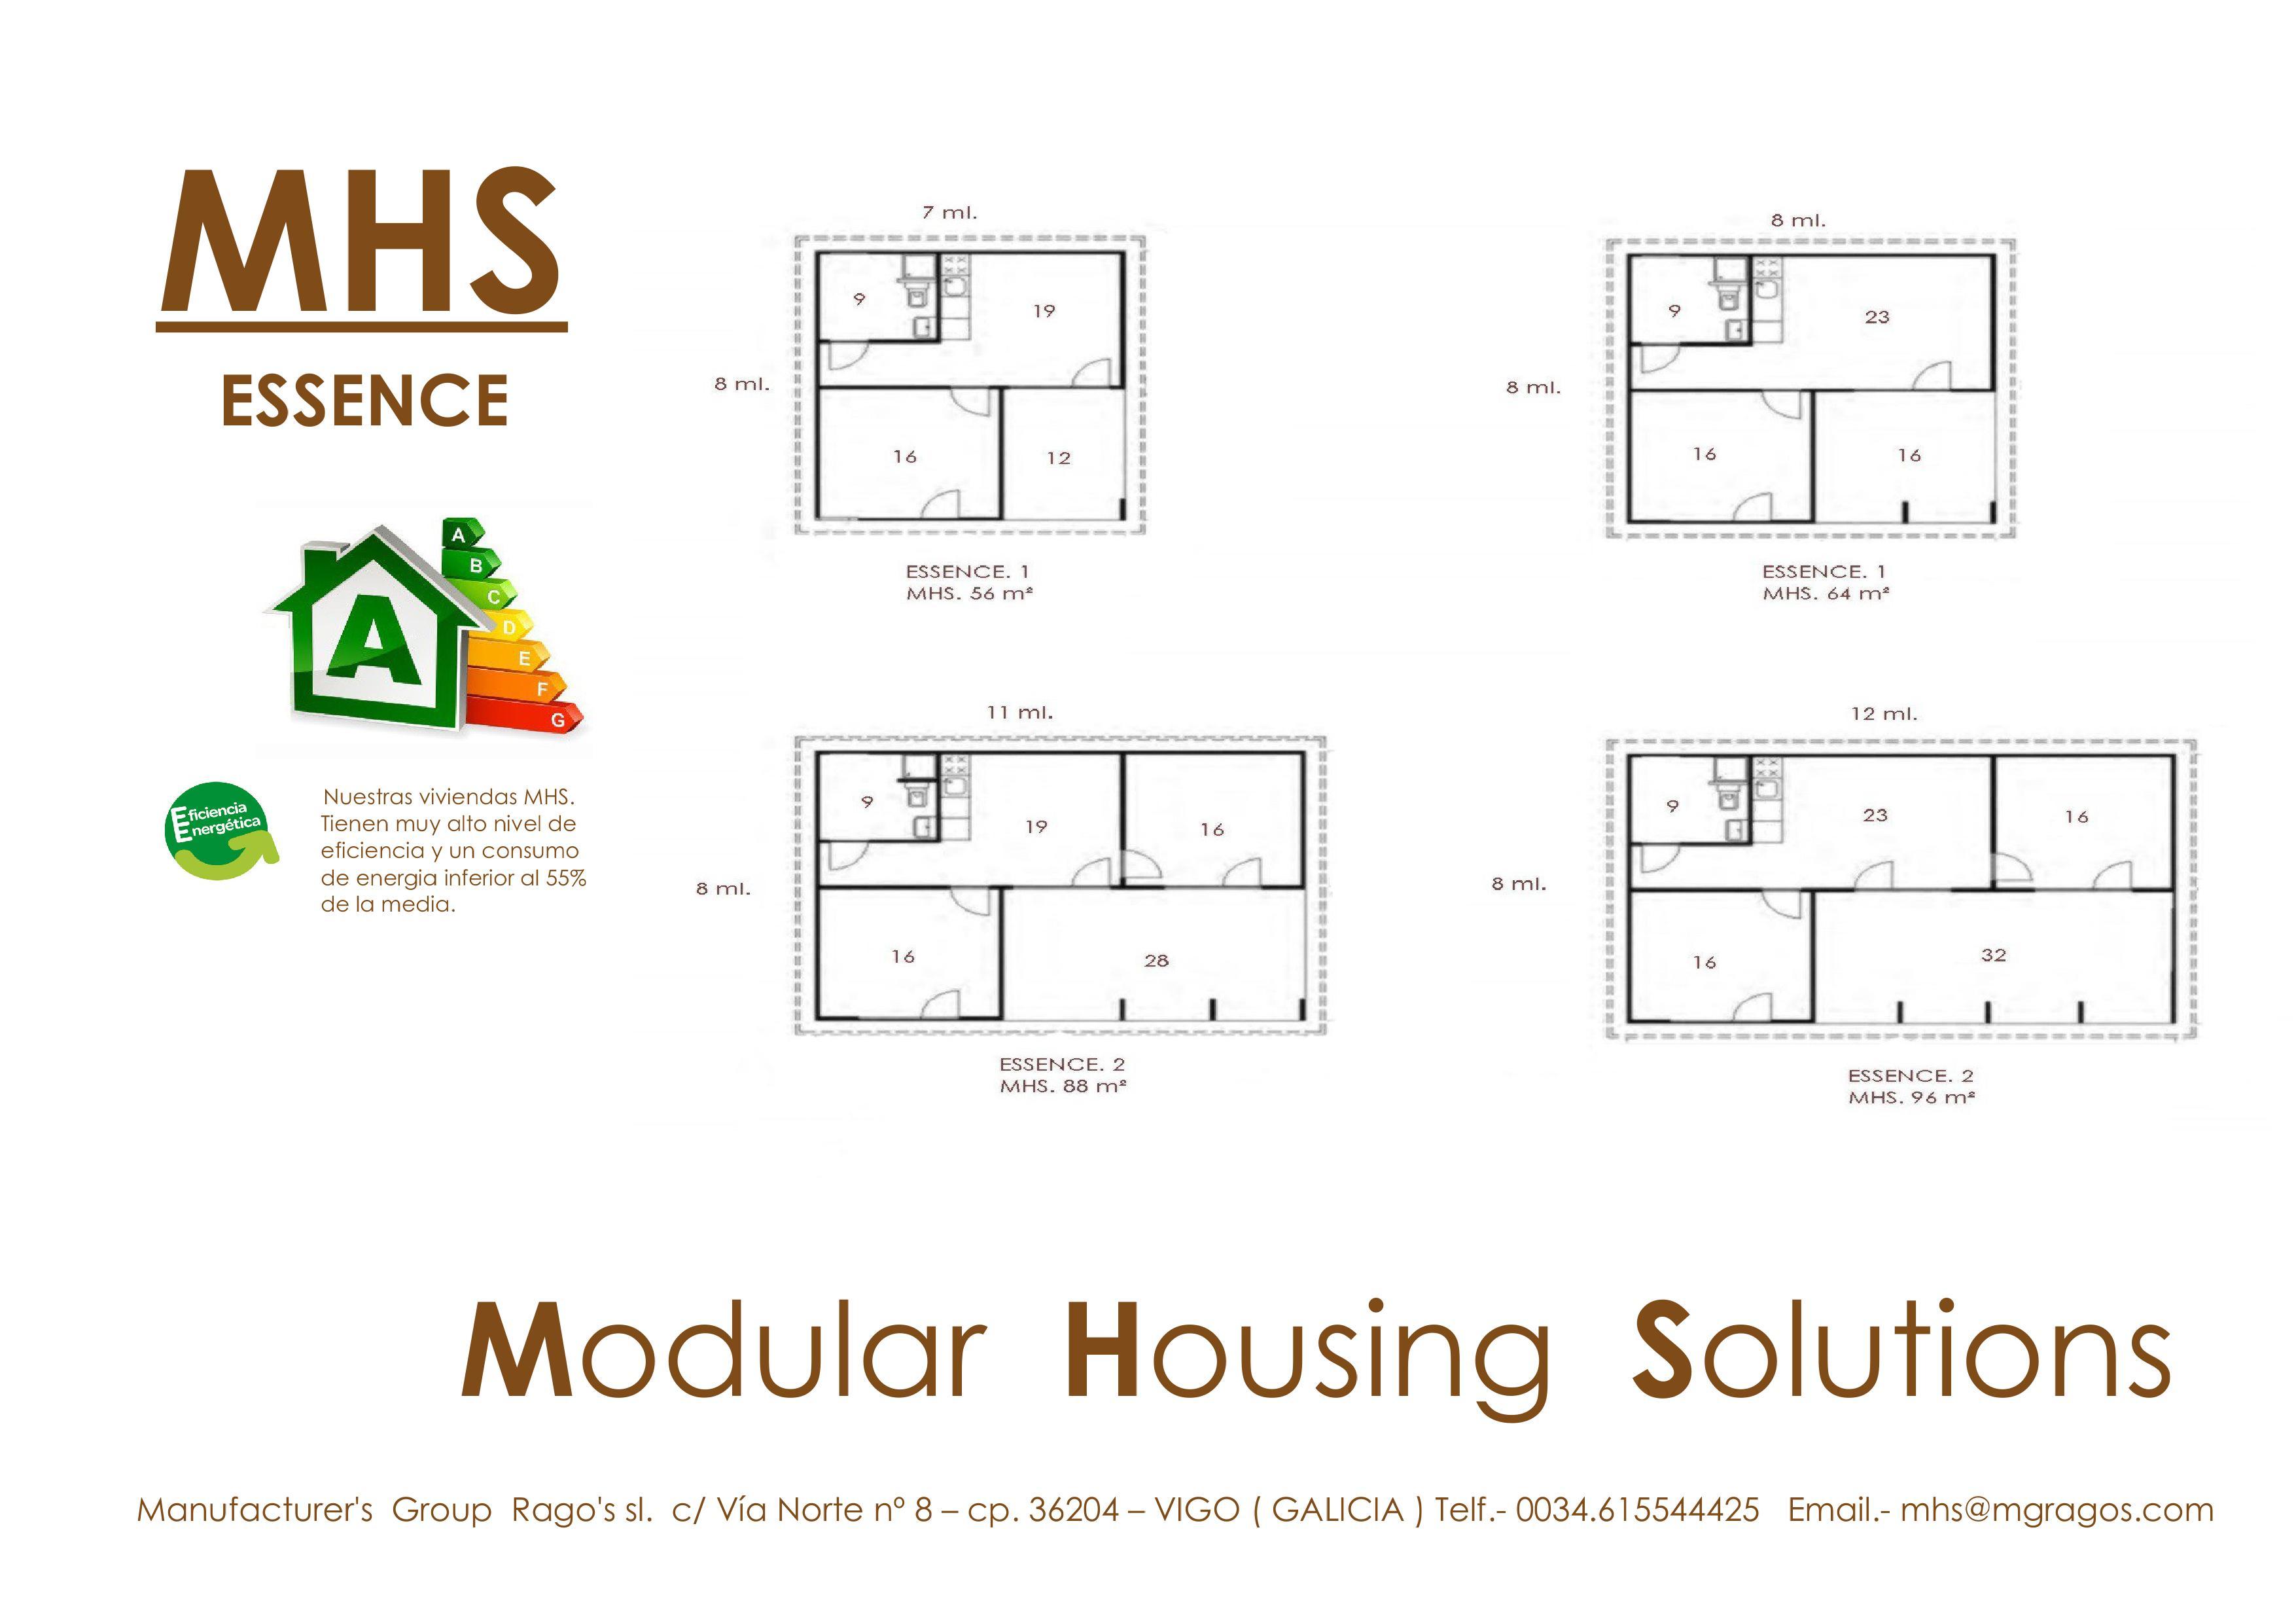 Modelo MHS ESSENCE-7